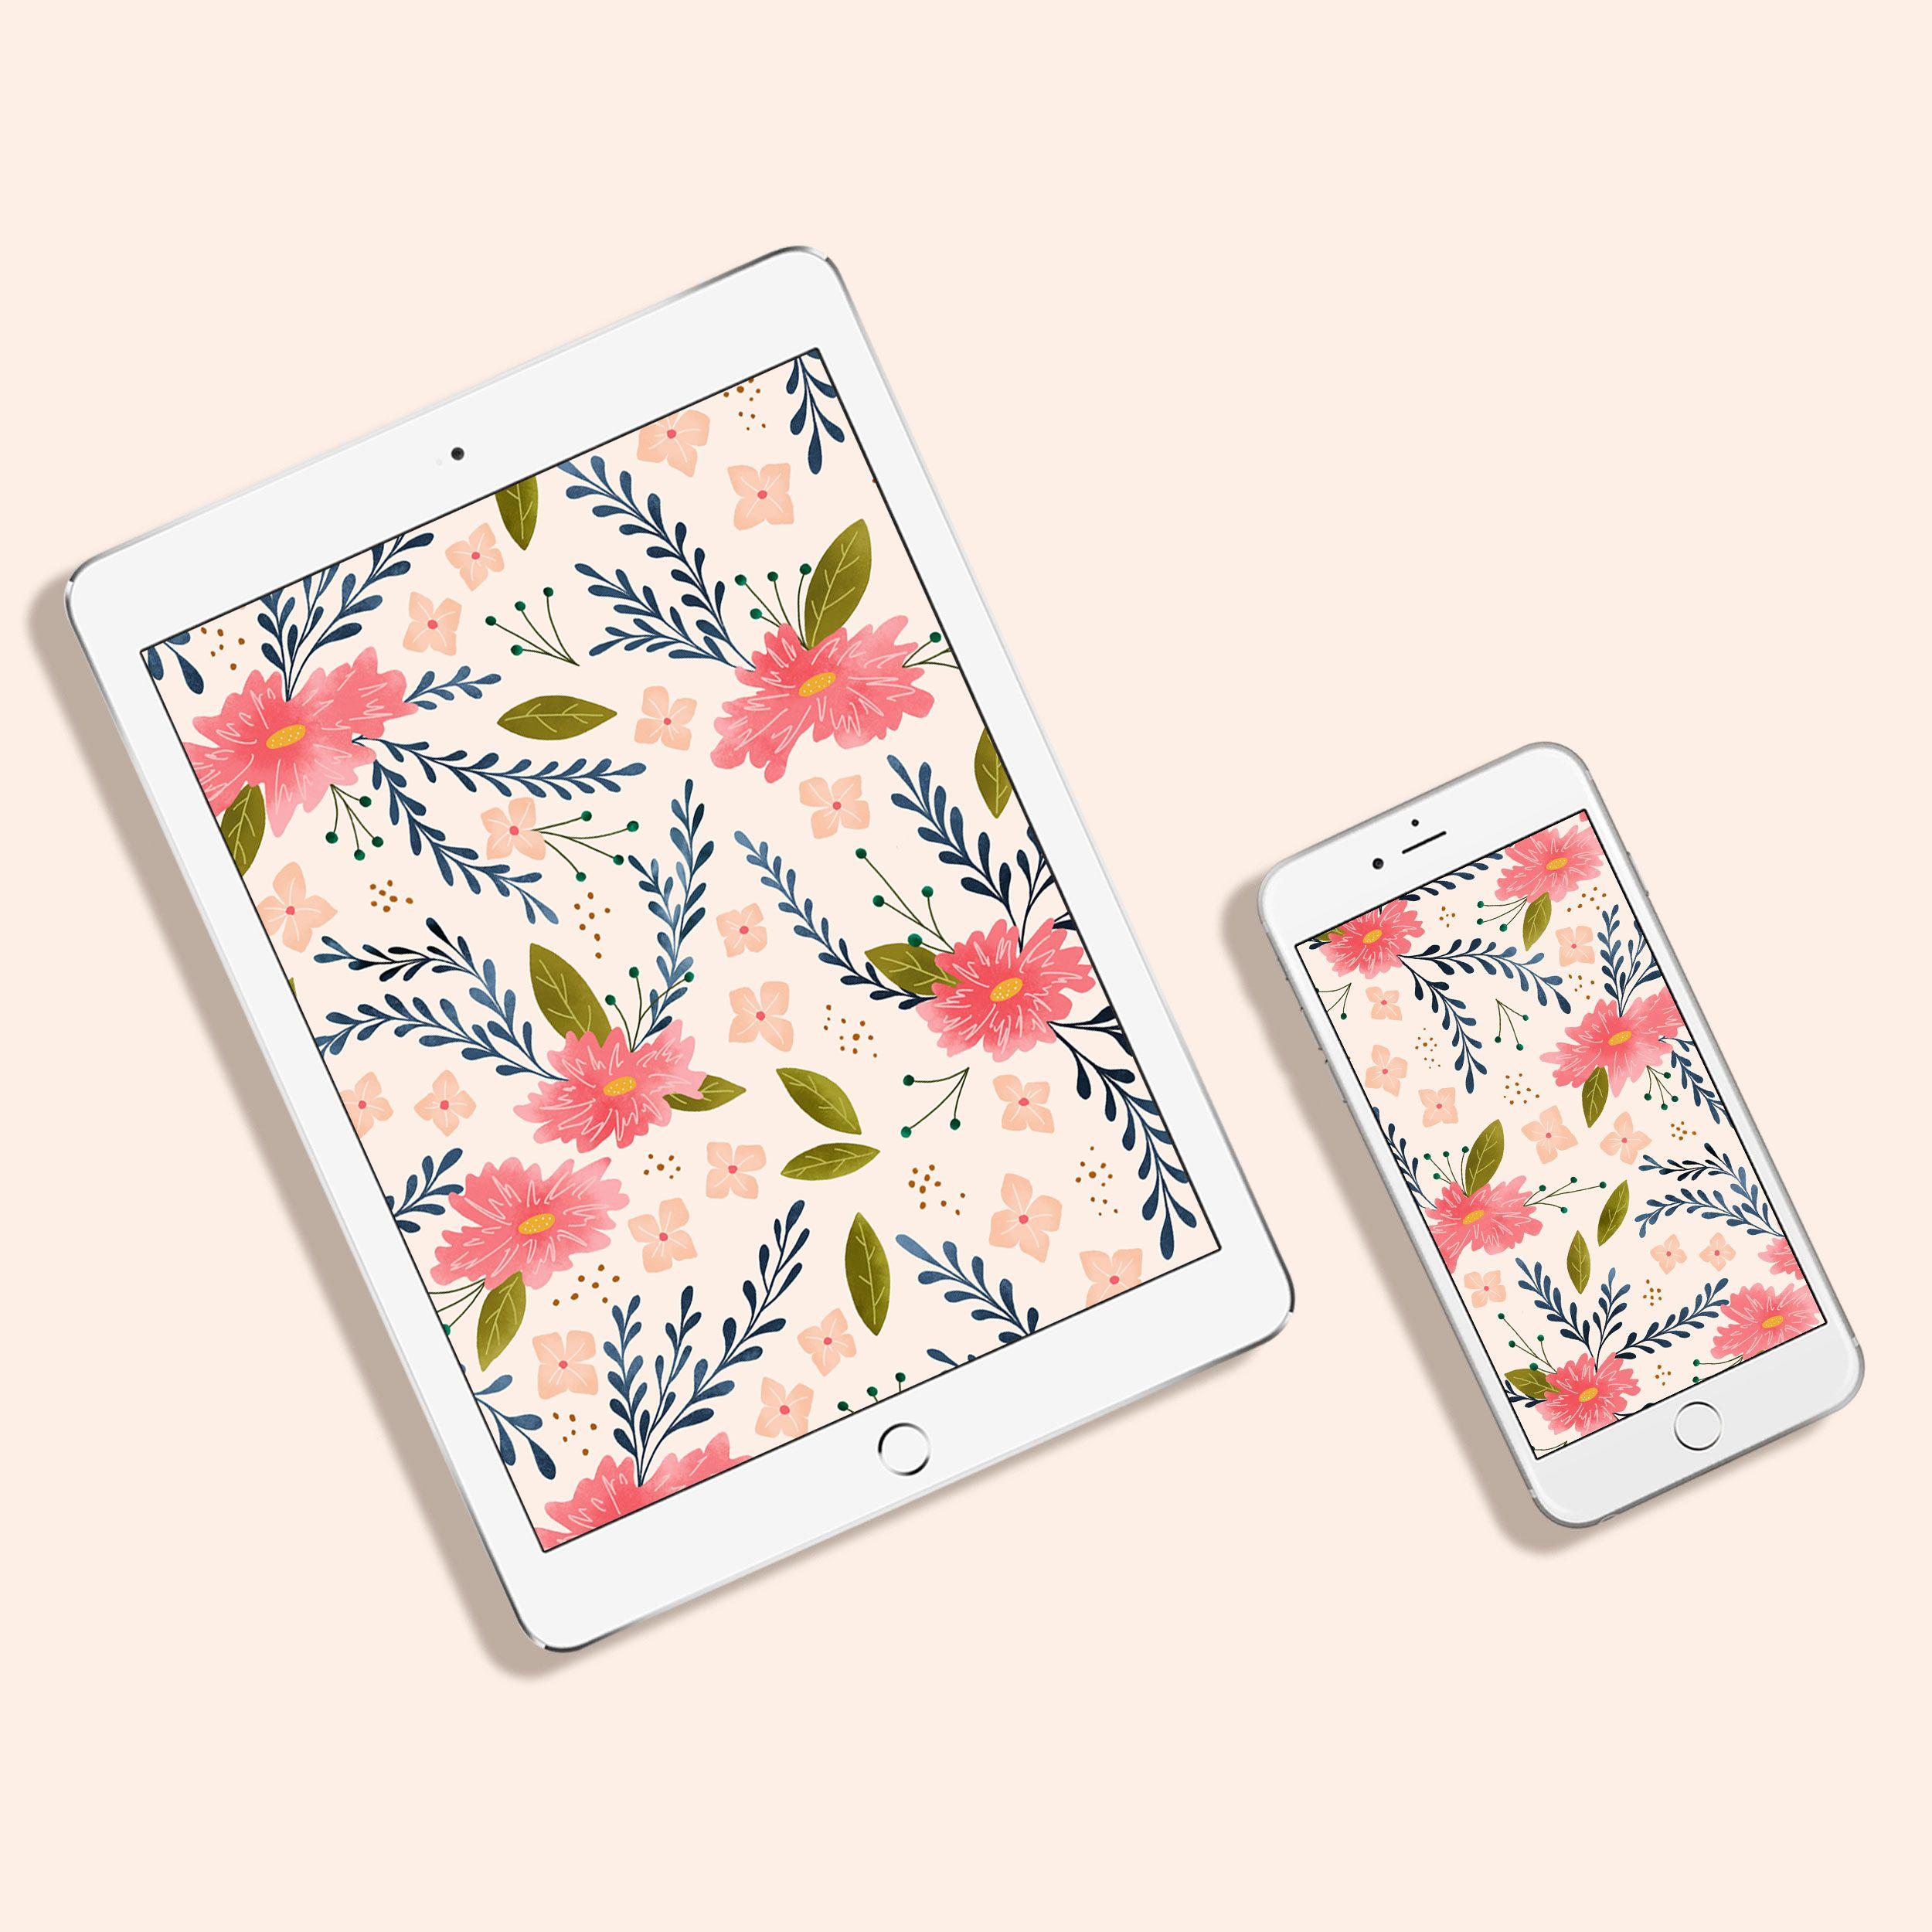 Bloom Desktop Phone And Tablet Wallpaper Tablet Wallpaper Wallpaper Bloom